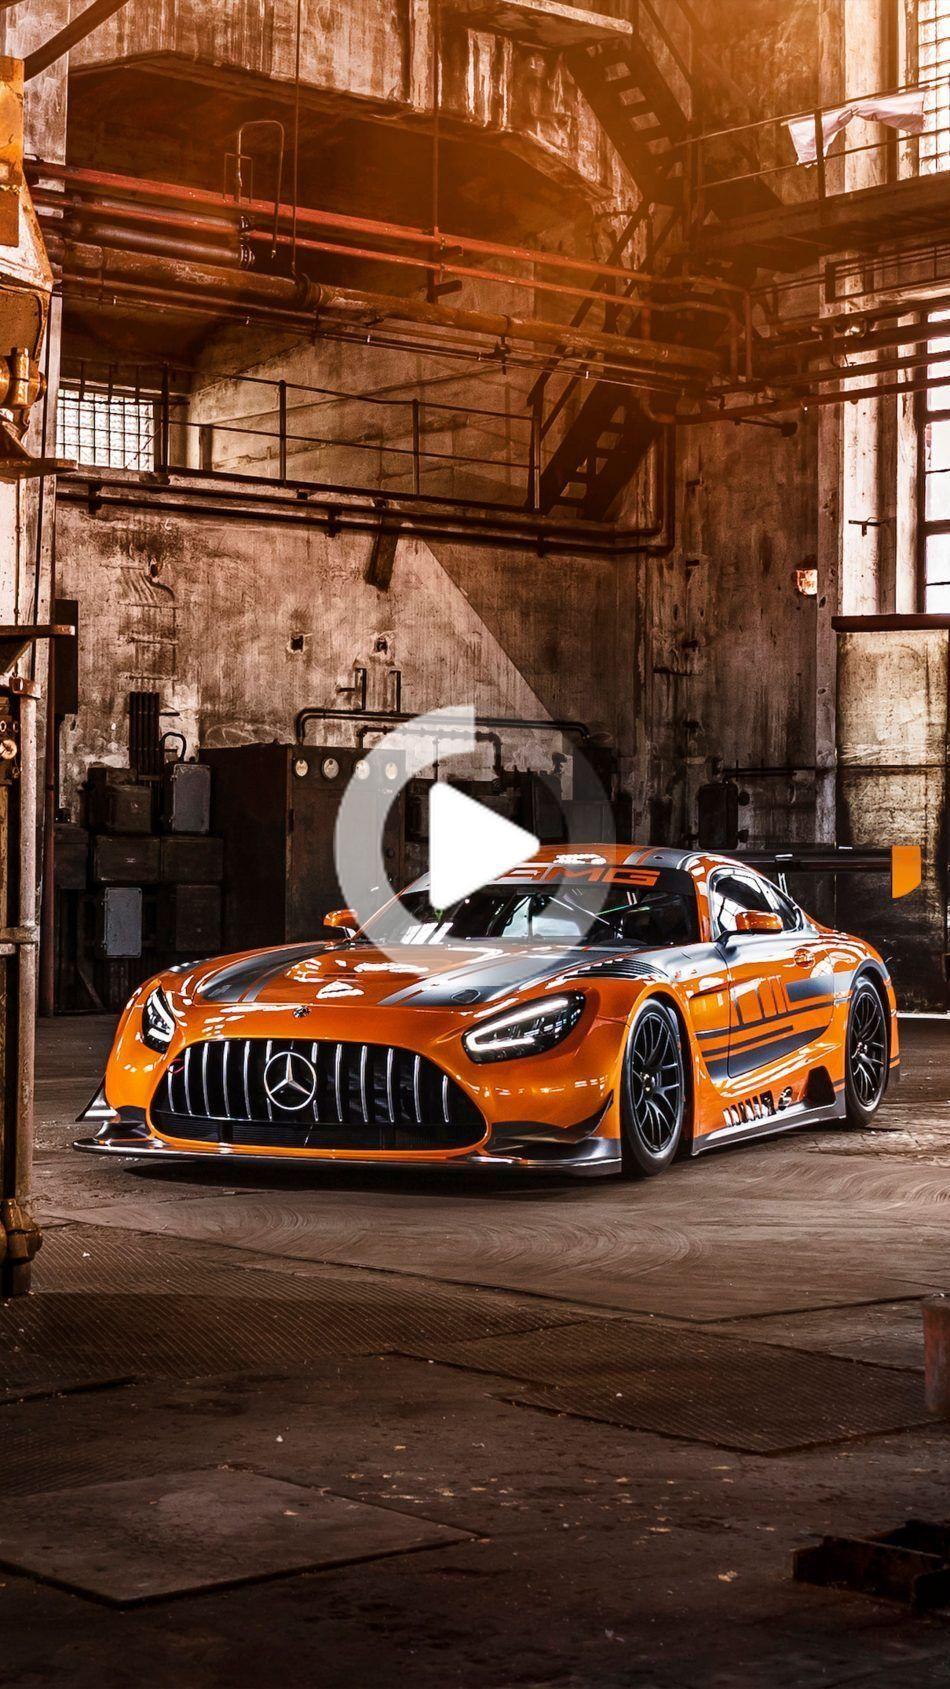 Mercedes AMG GT3 2019 Free 4K Ultra HD Mobile Wallpaper in ...